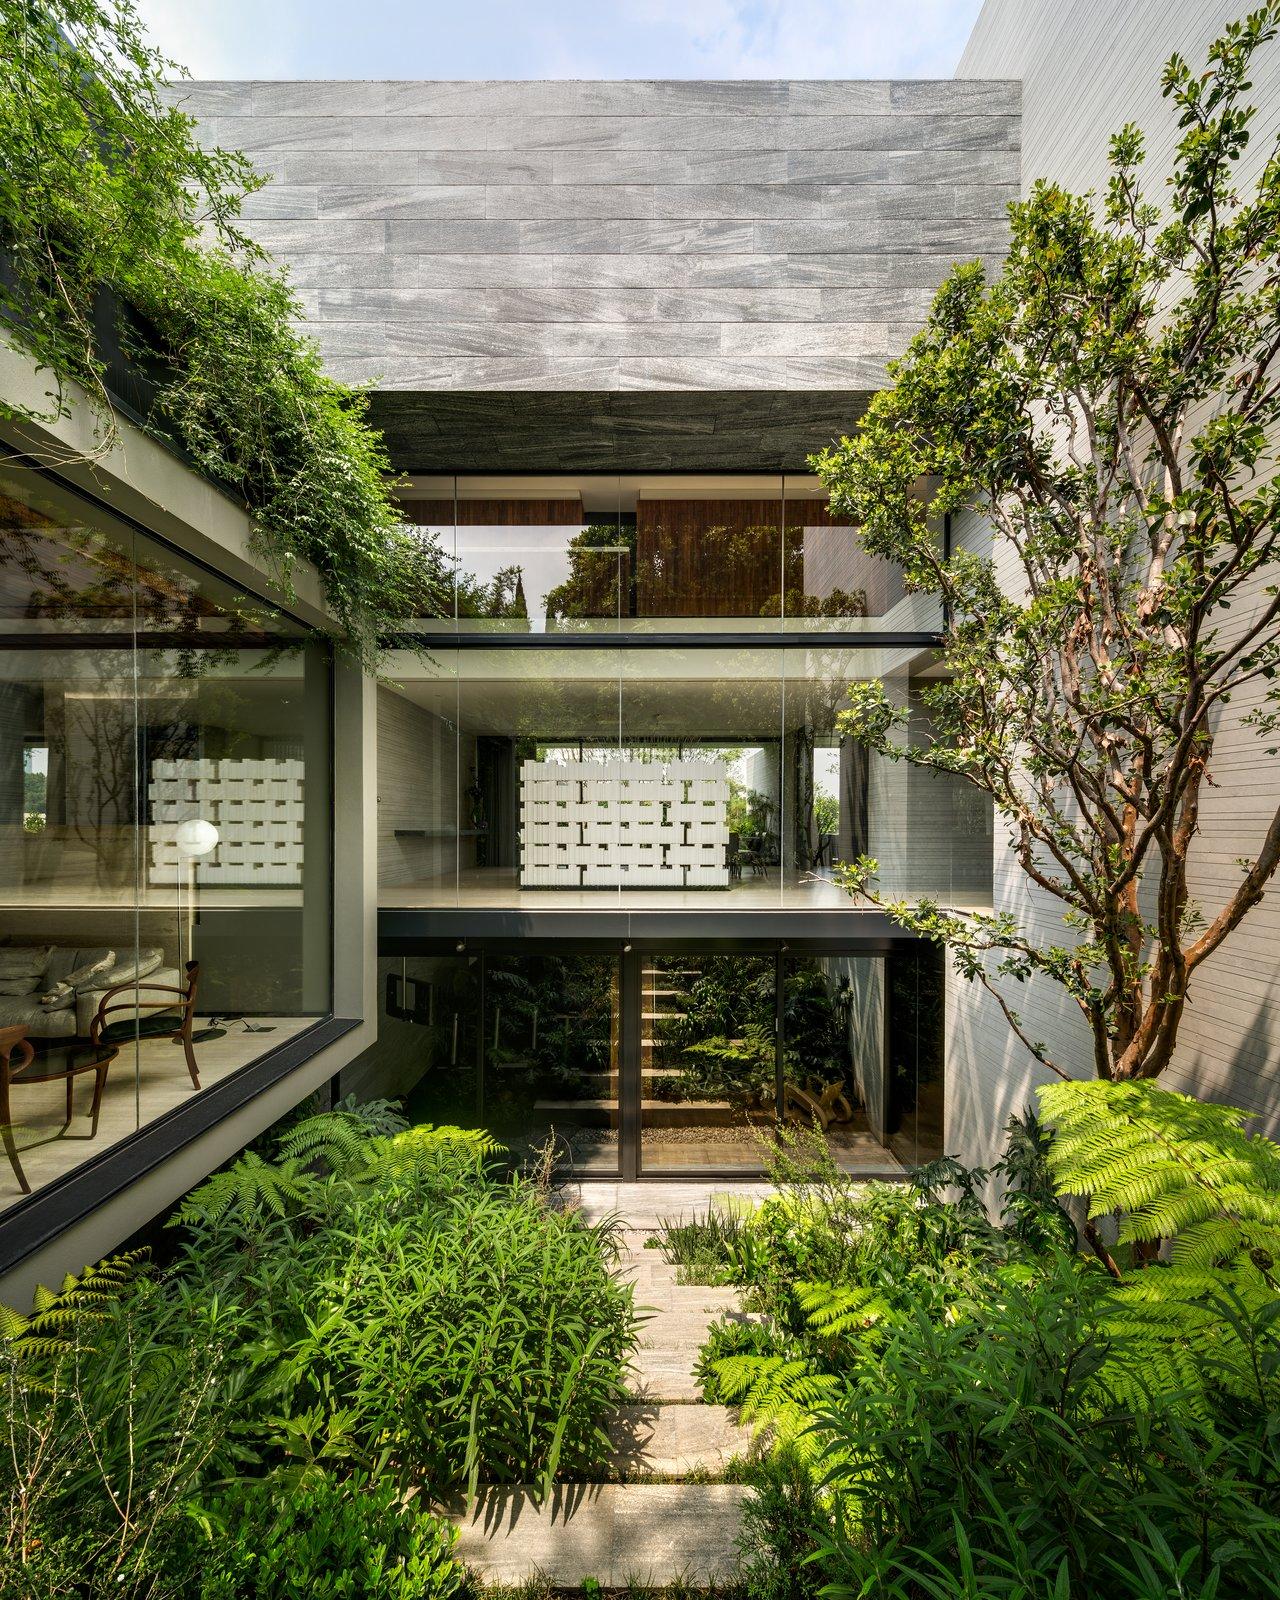 Tagged: Outdoor and Garden.  Casa O Cuatro by Migdal Arquitectos